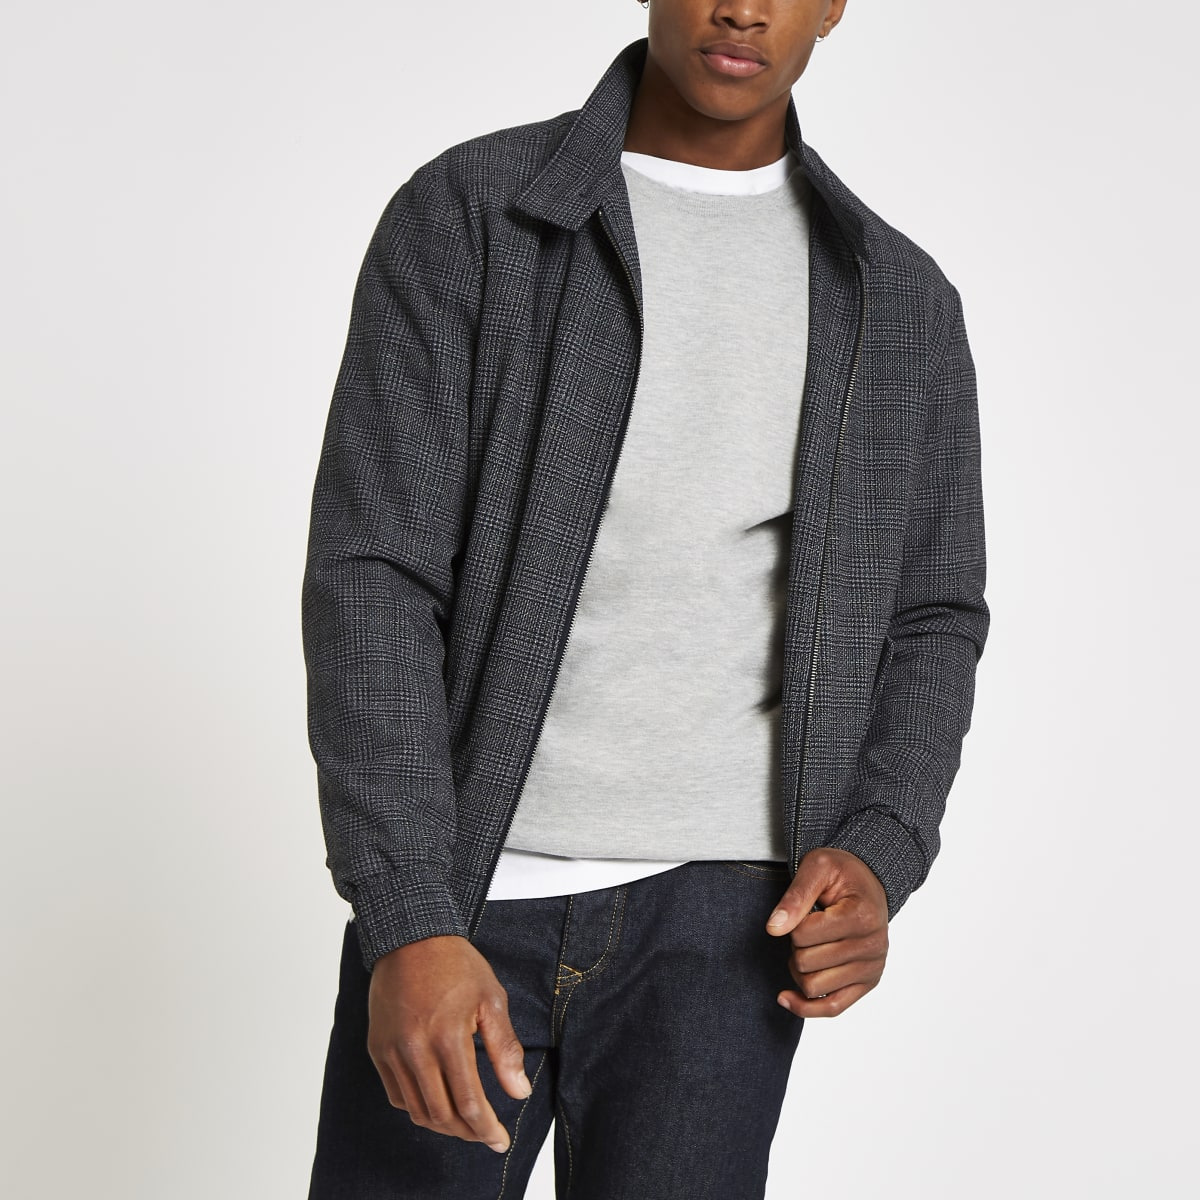 Selected Homme grey check Harrington jacket